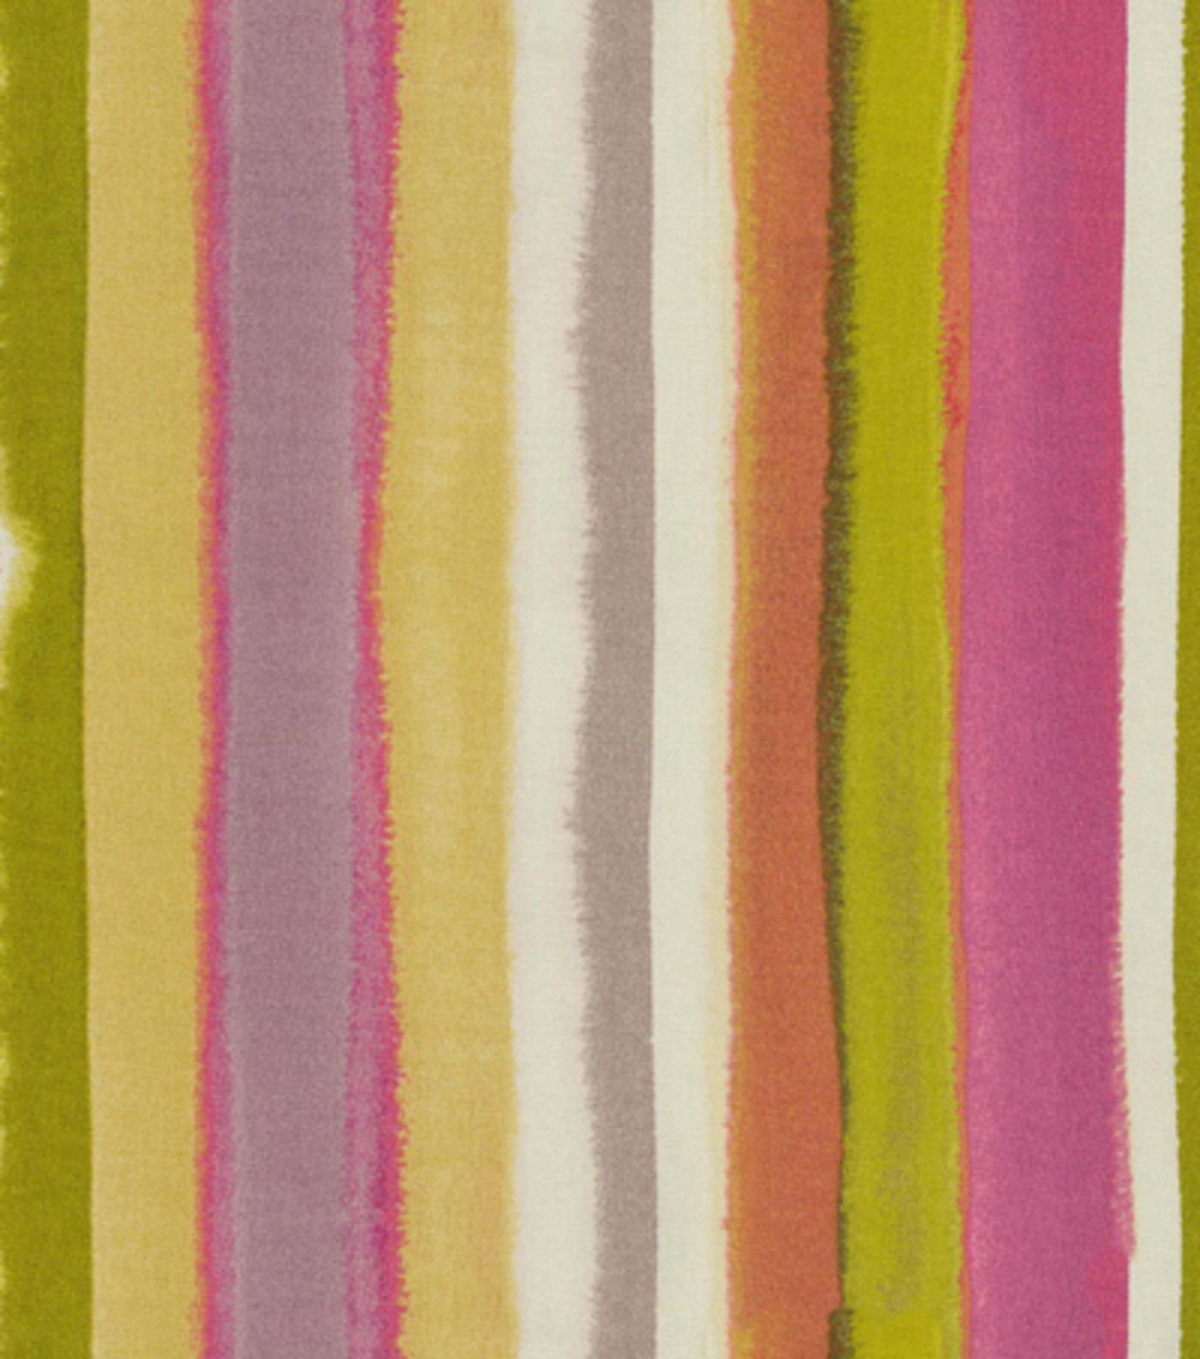 Fabric Tape - Sewing Tape Batting Tape 30